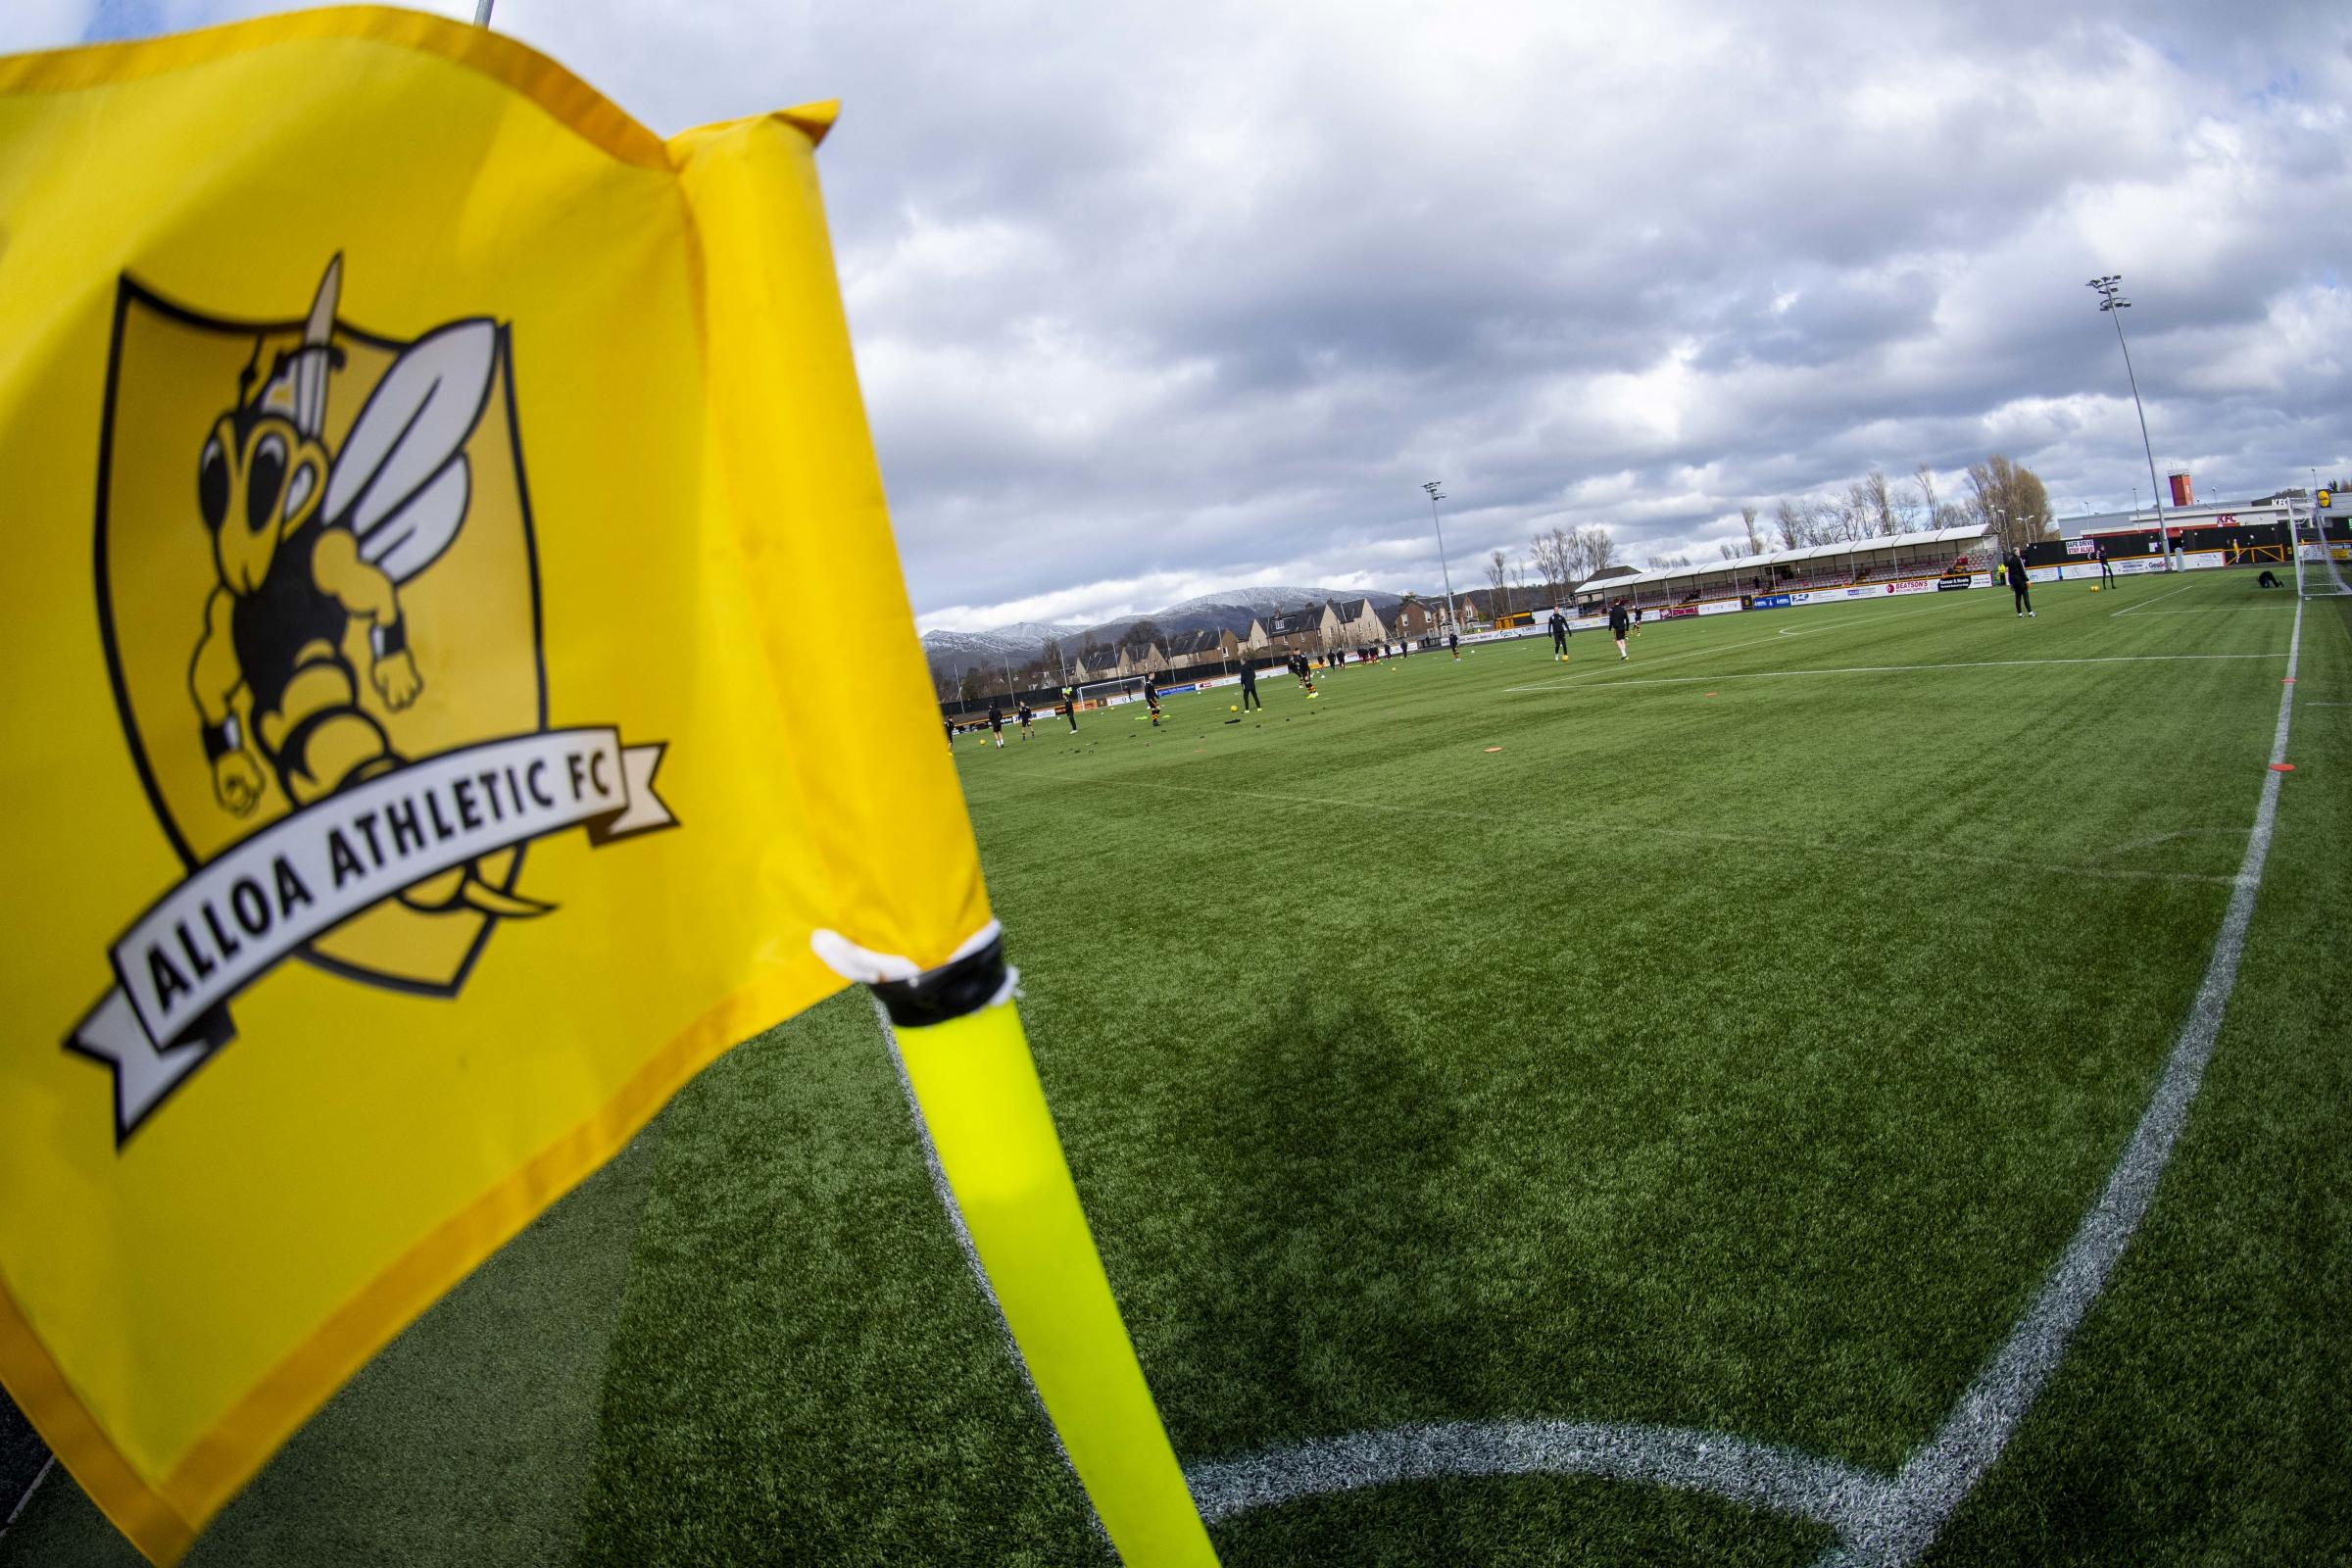 Alloa 3-1 East Fife: Wasps claim first win of new season